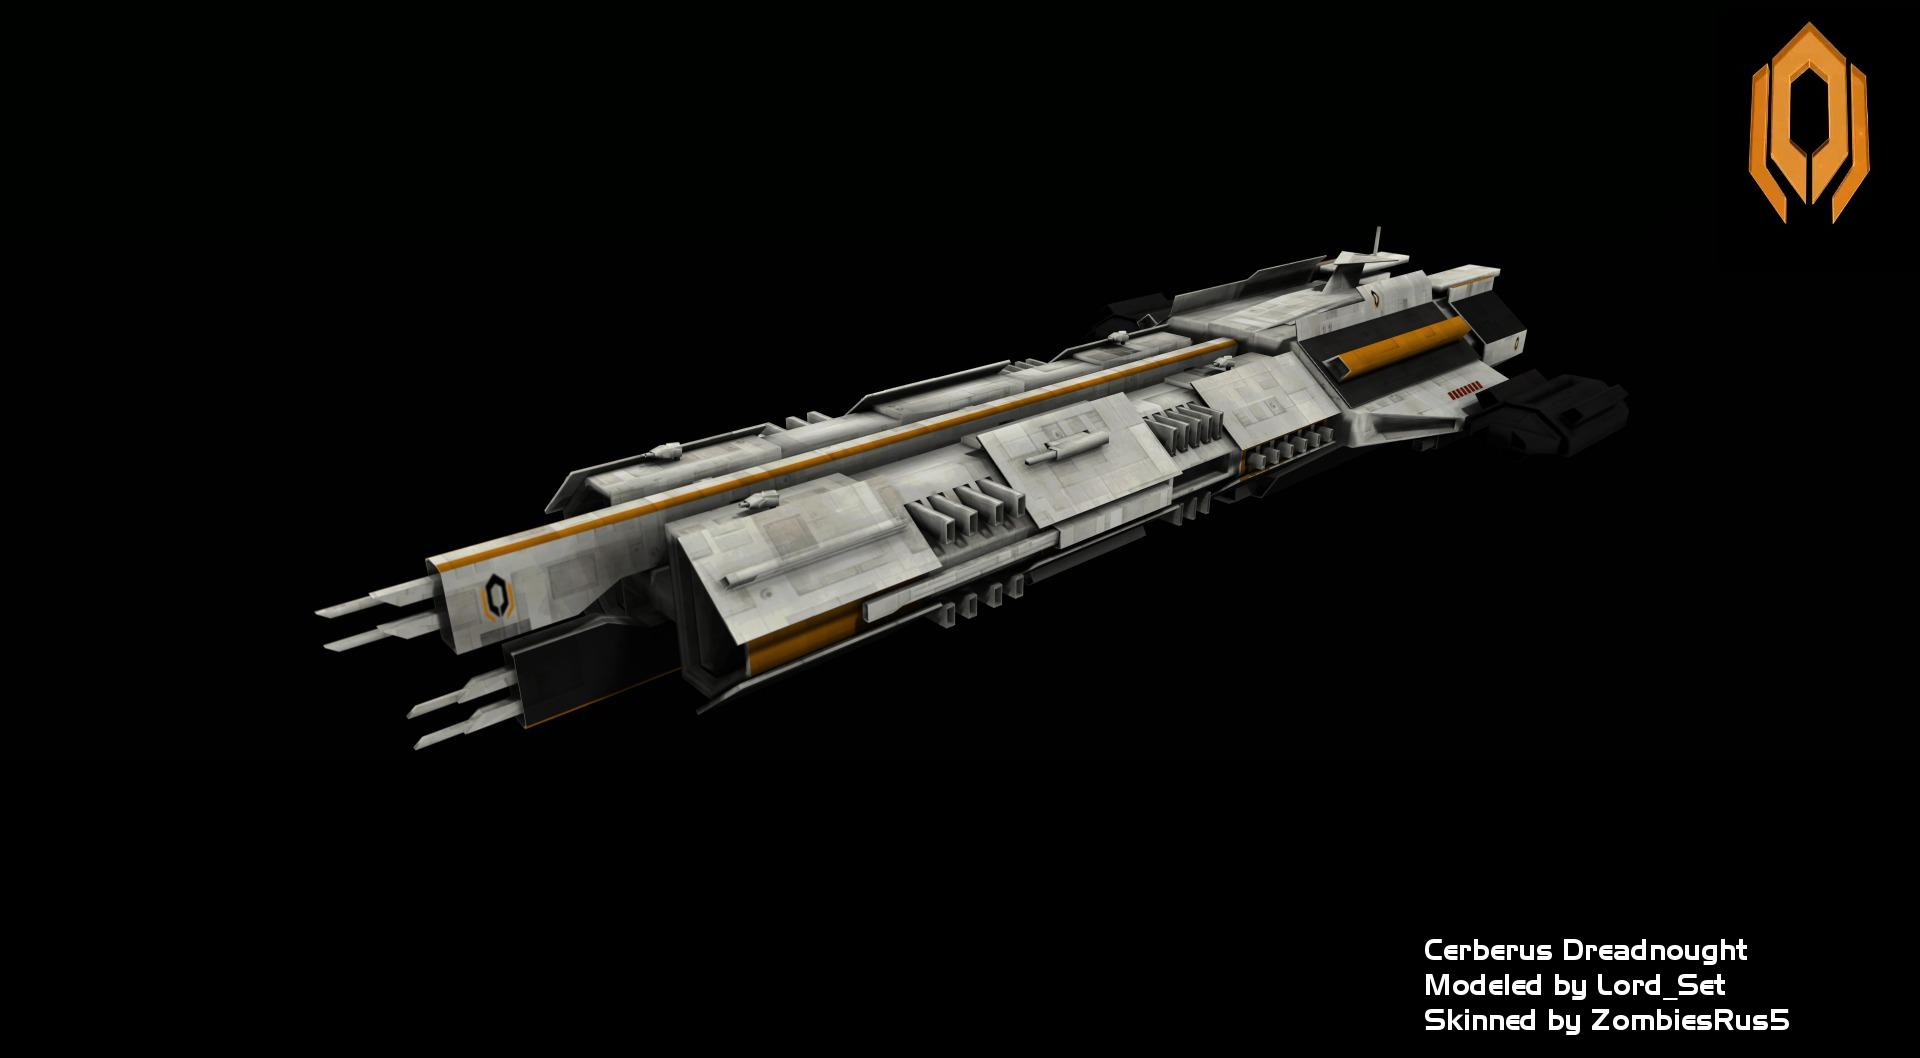 Mass Effect Ships Cerberus Dreadnought Reskinned Image Dawn Of